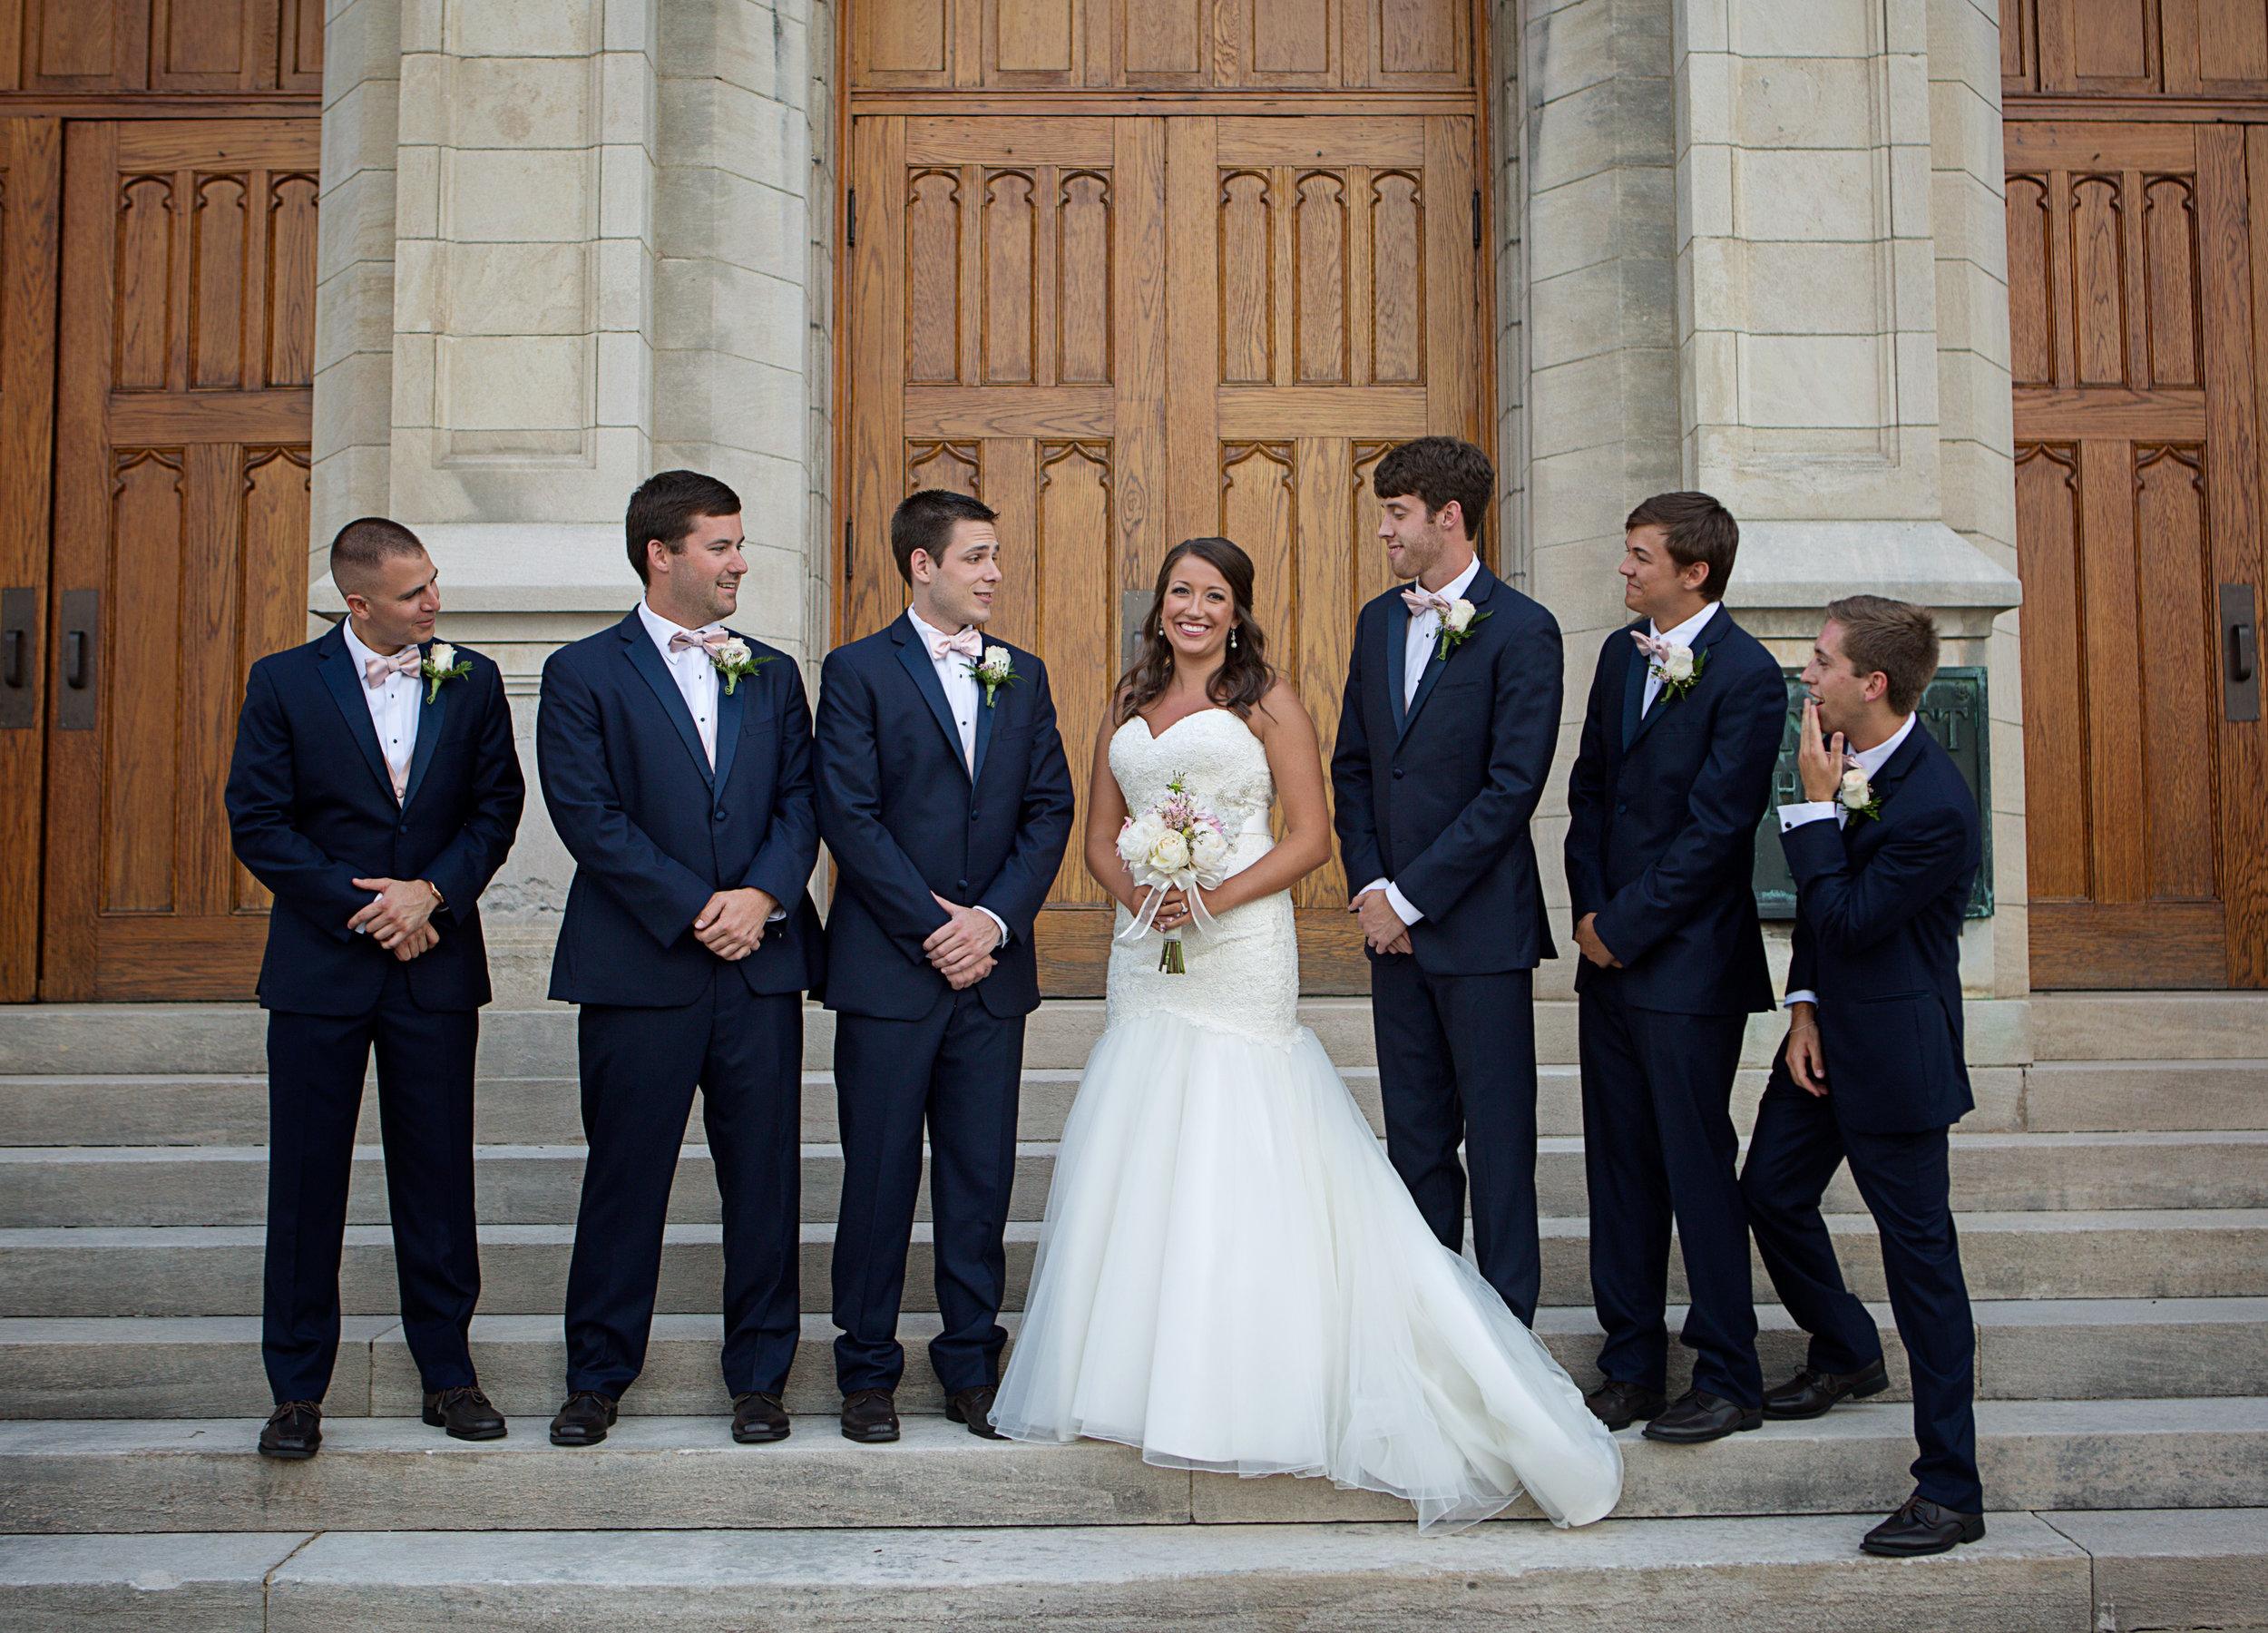 Southall Wedding 0262.jpg